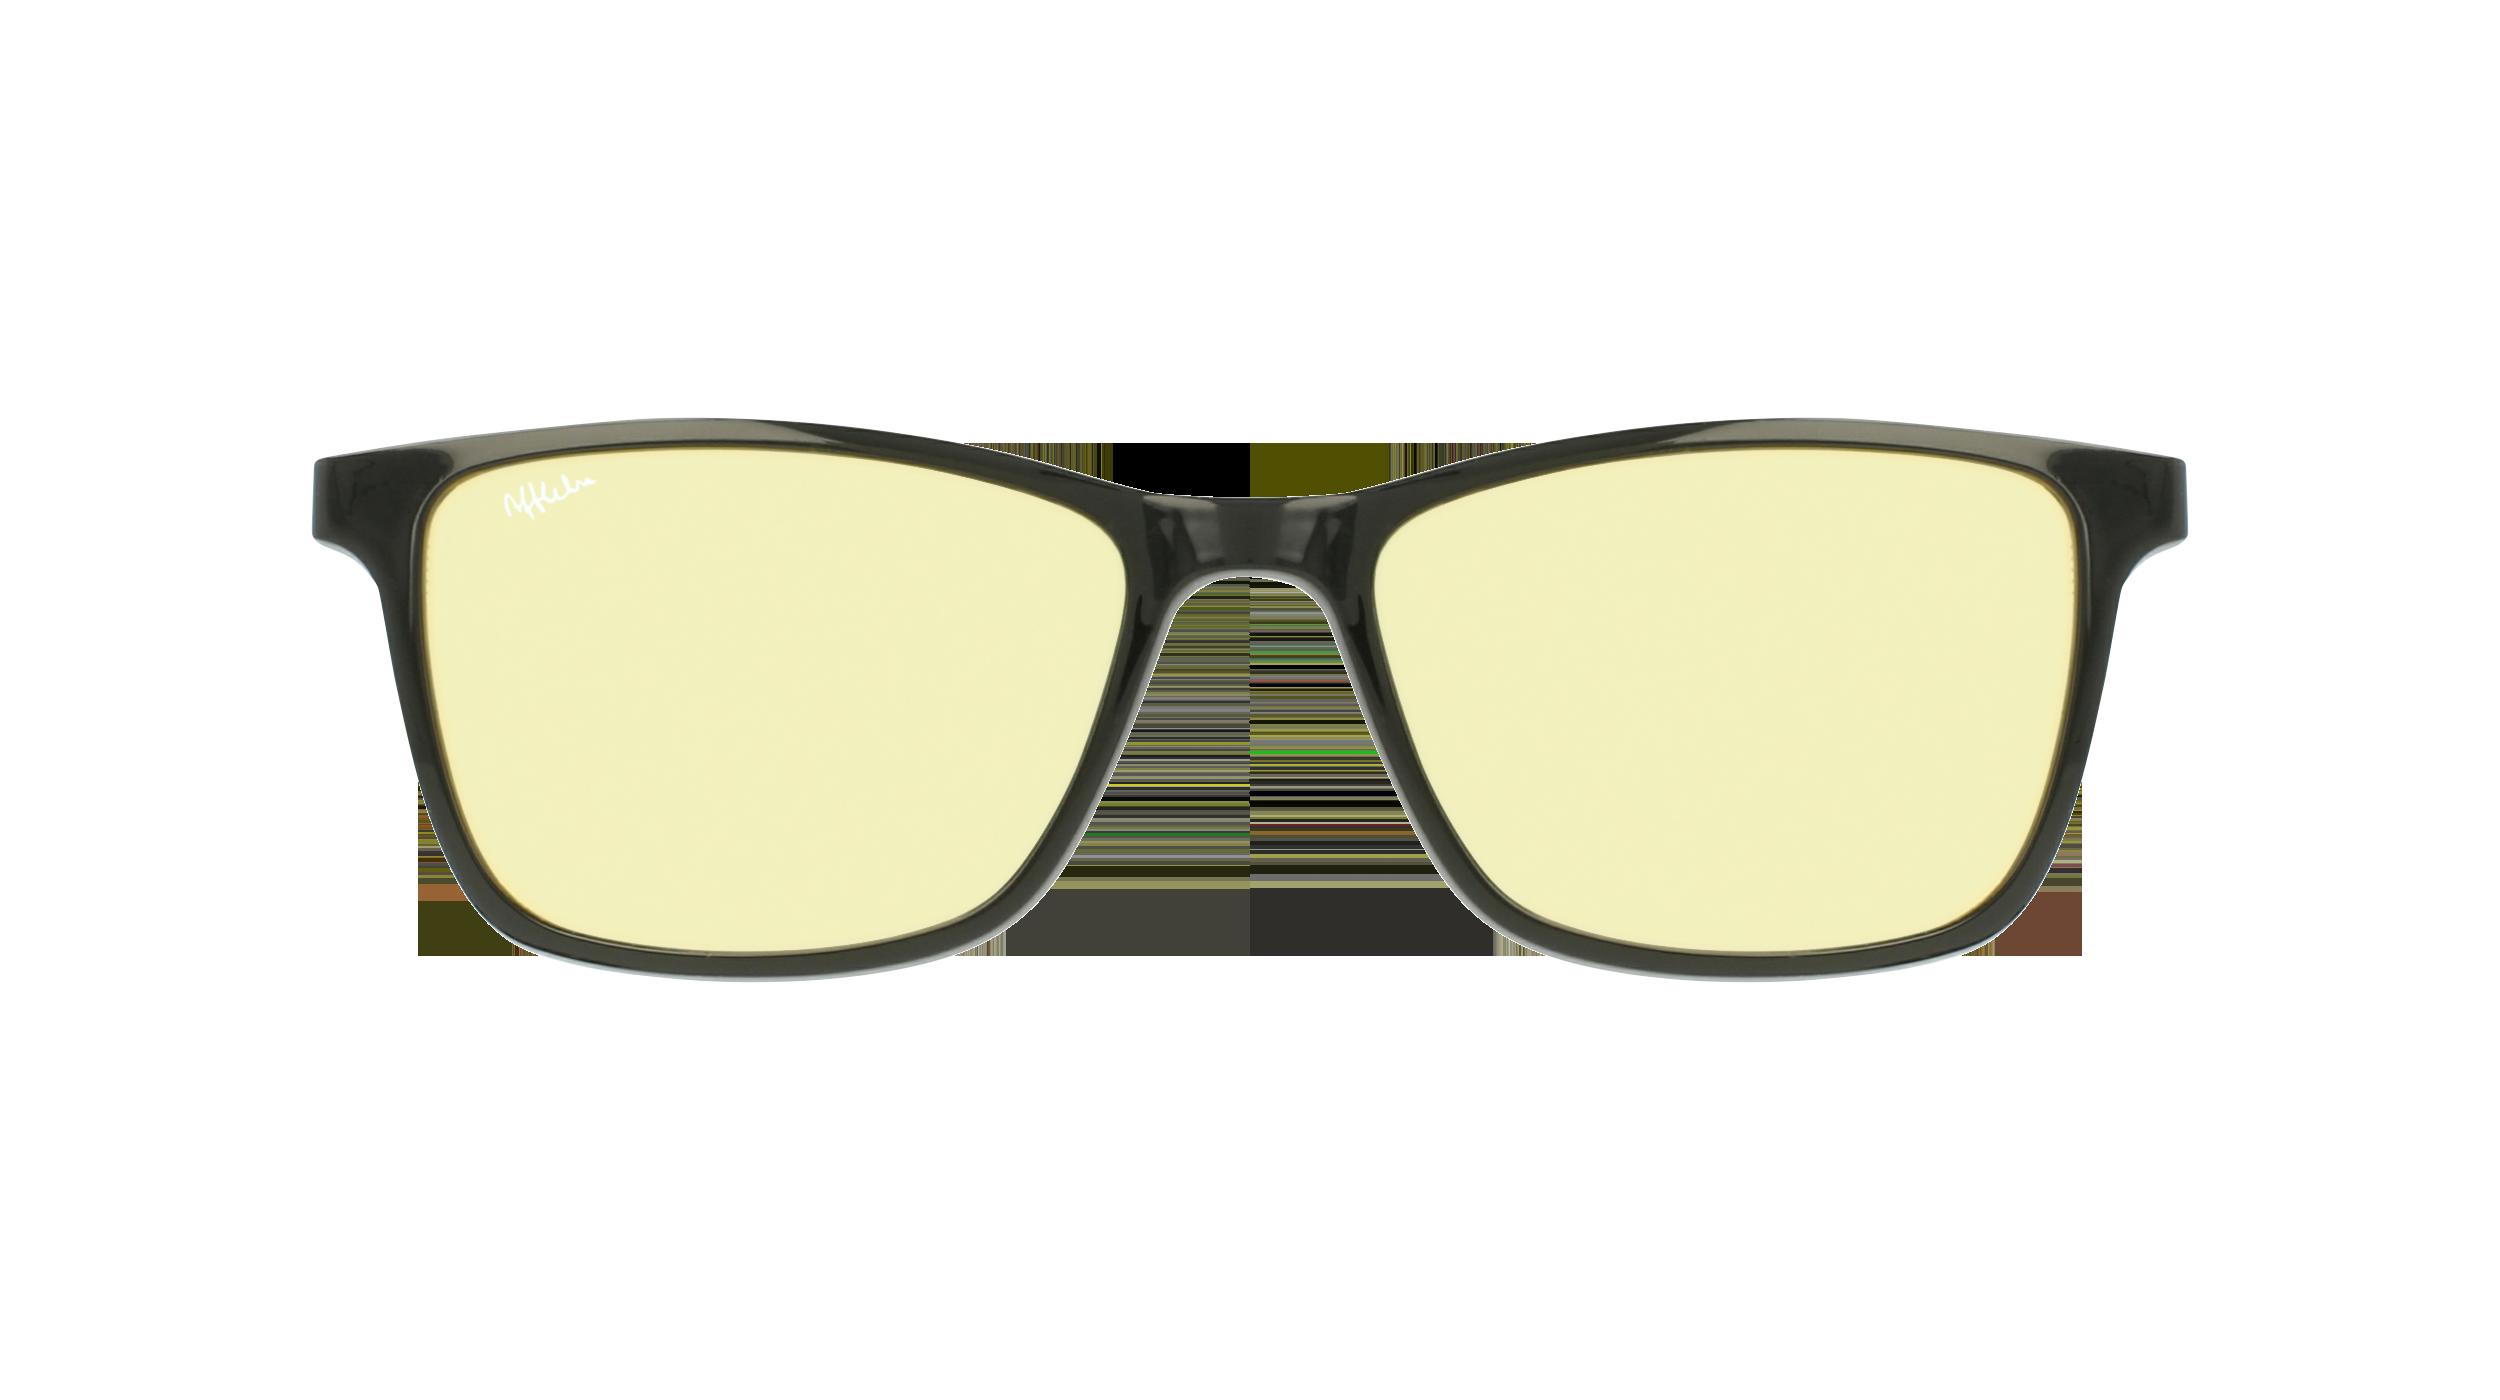 afflelou/france/products/smart_clip/clips_glasses/07630036457788.png